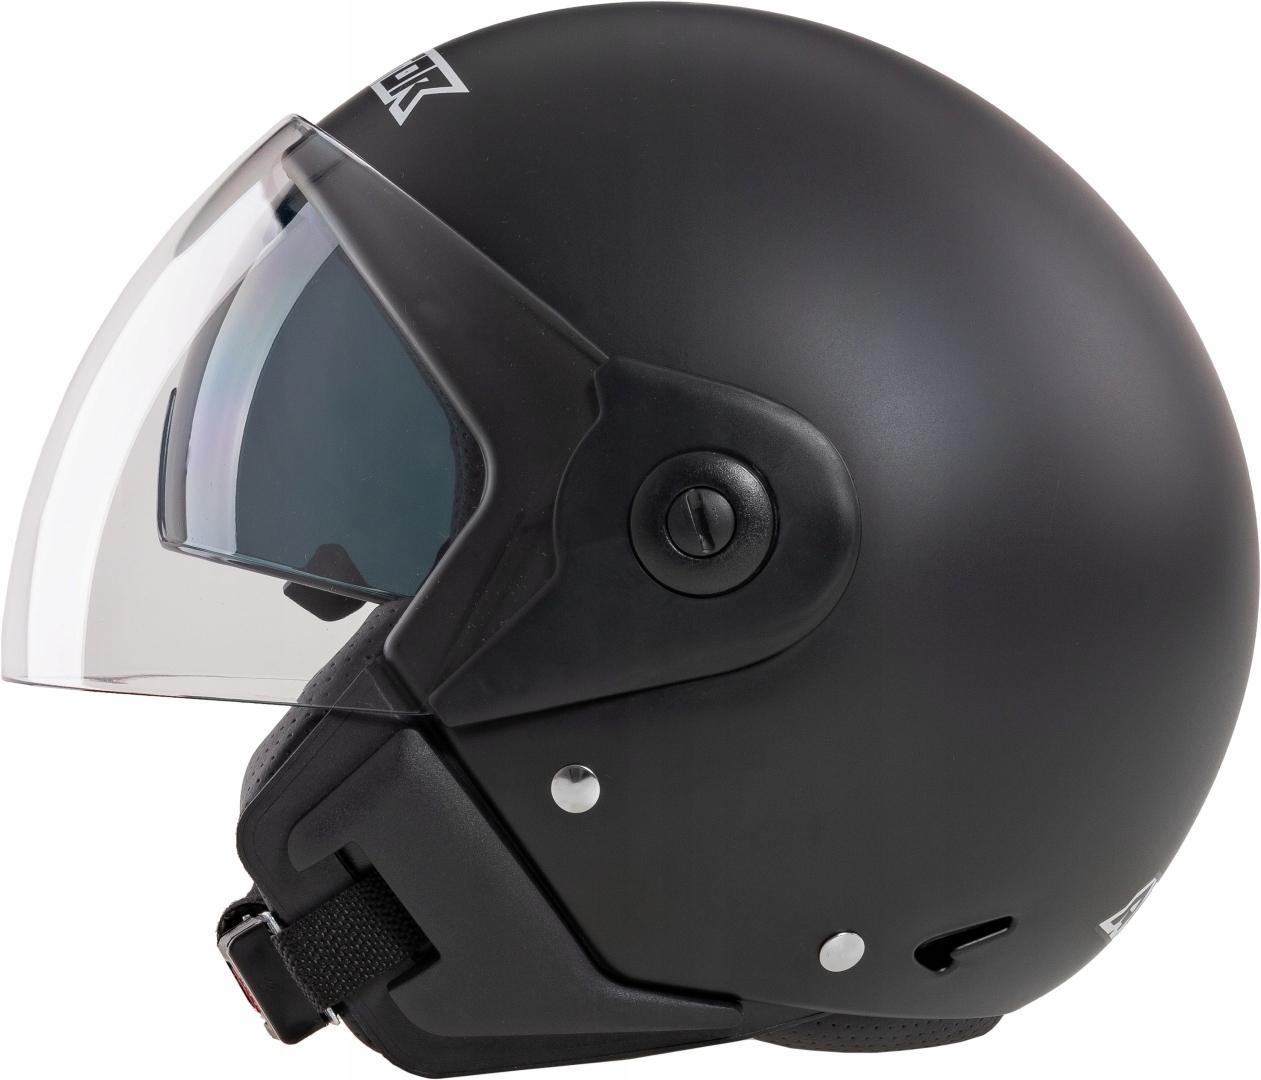 KASK MOTOCYKLOWY OTWARTY NA MOTOR SKUTER VT XXL